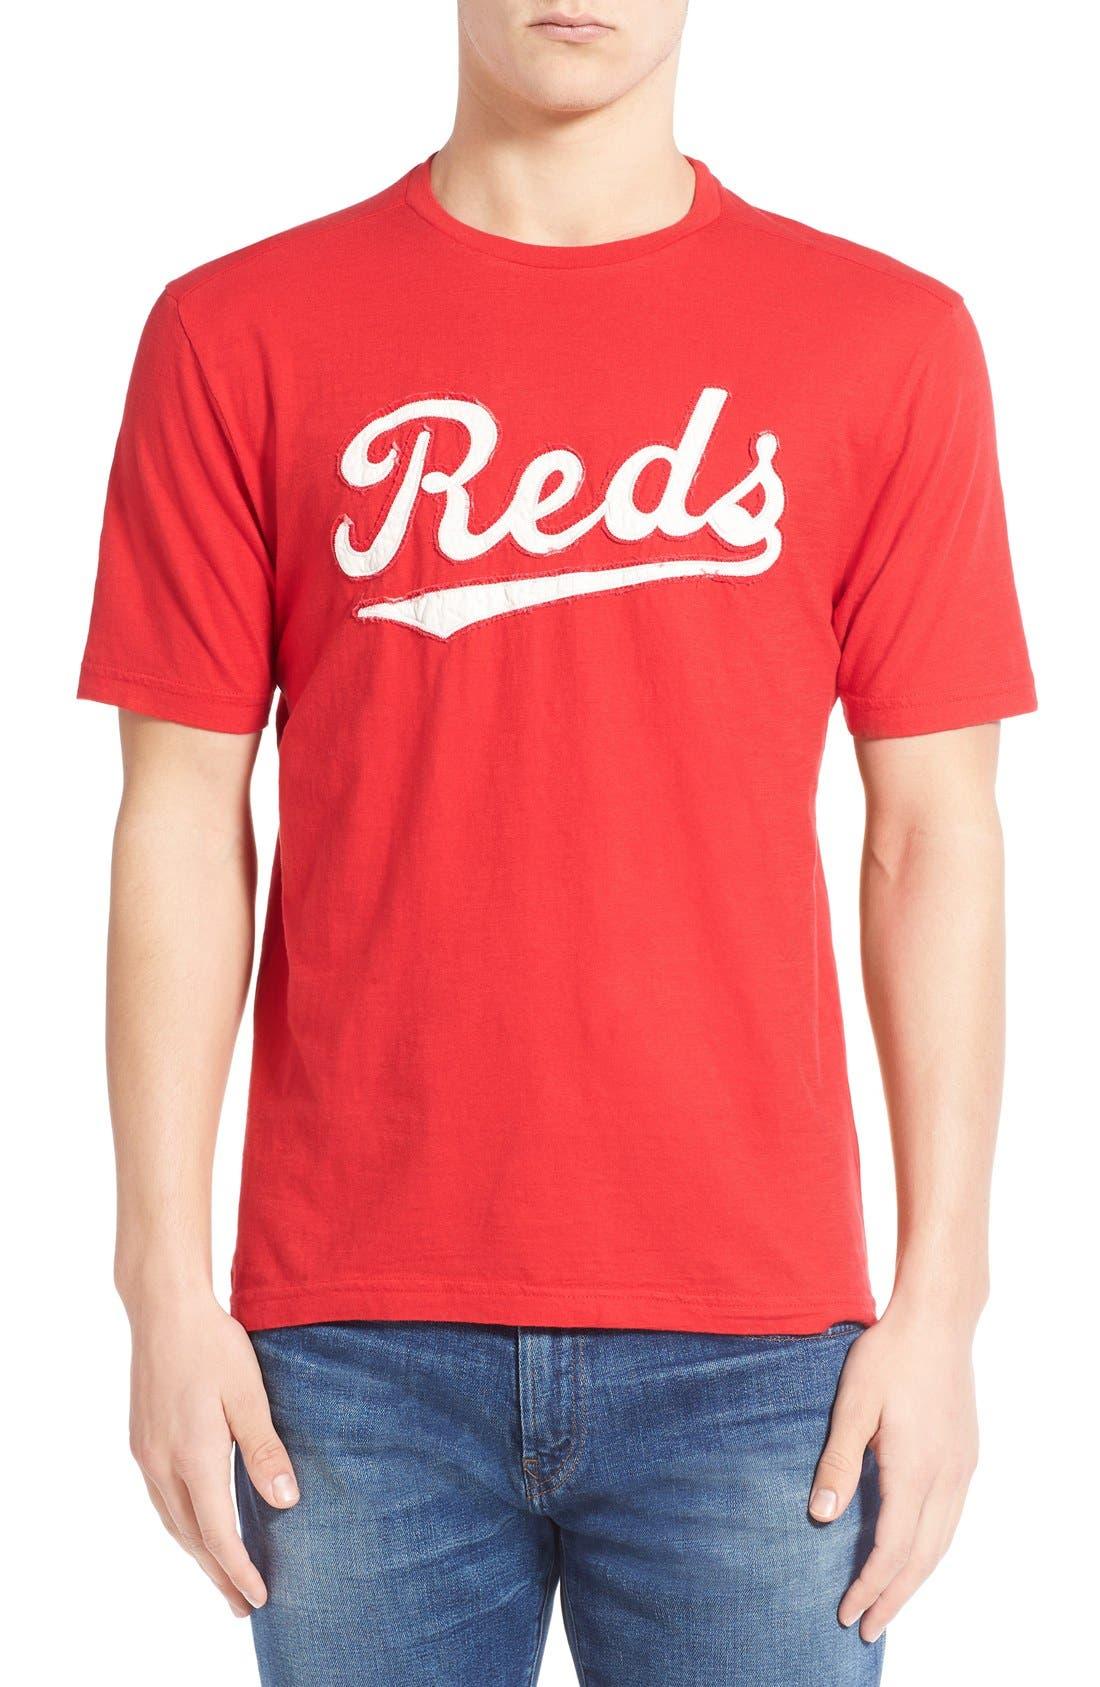 Red Jacket 'Cincinnati Reds - Twofold' Crewneck T-Shirt